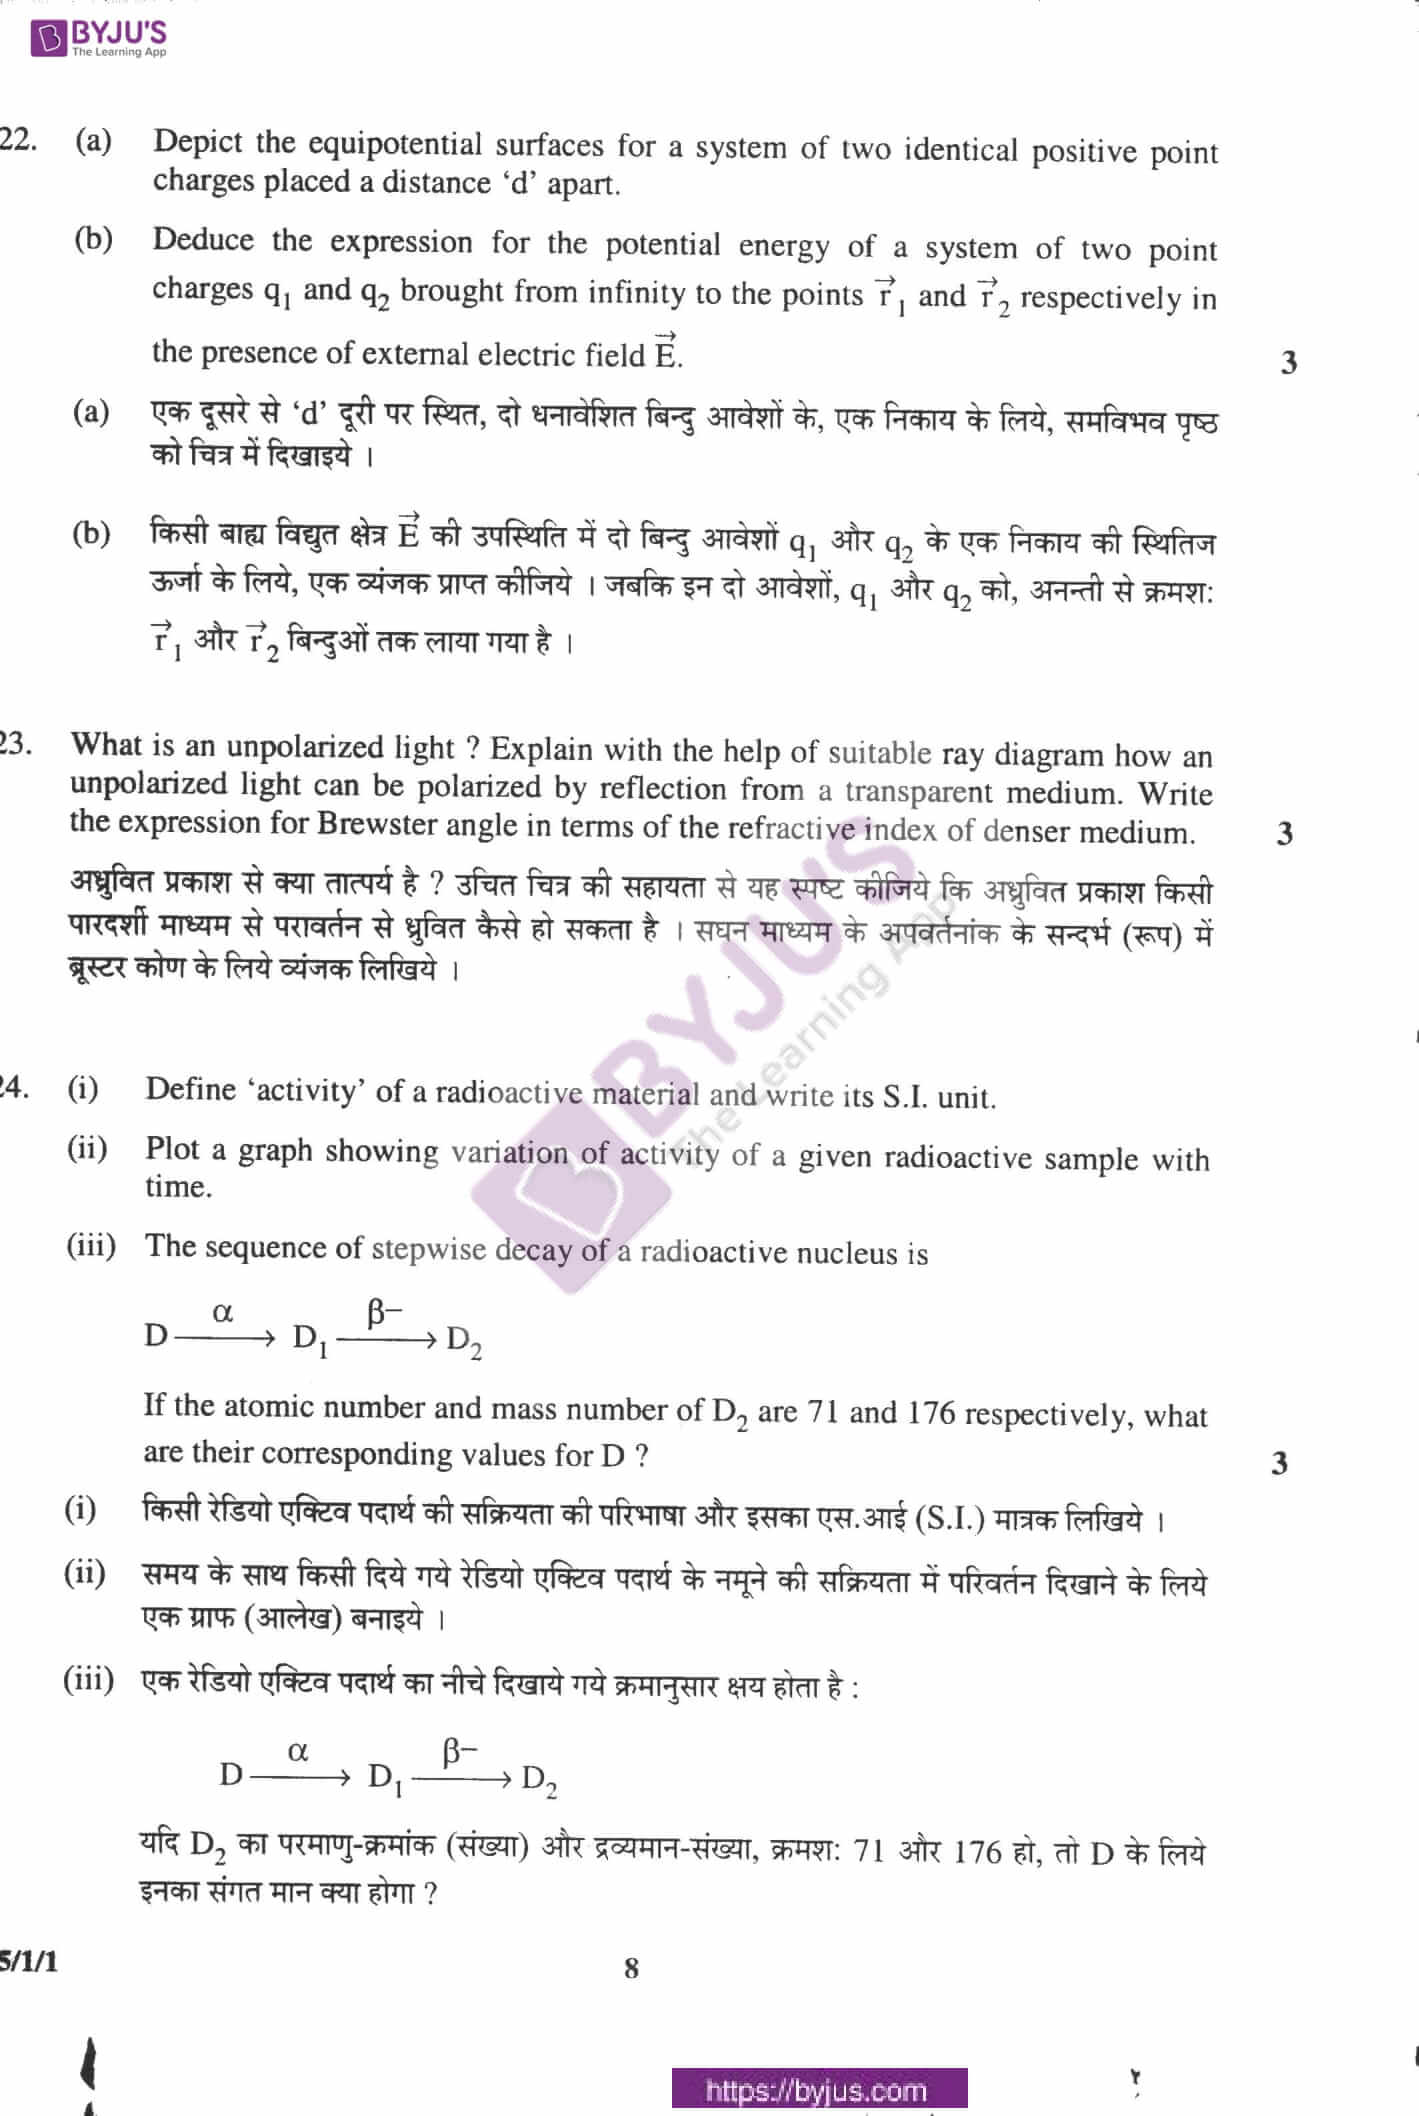 cbse class 12 physics question paper 2010 set 1